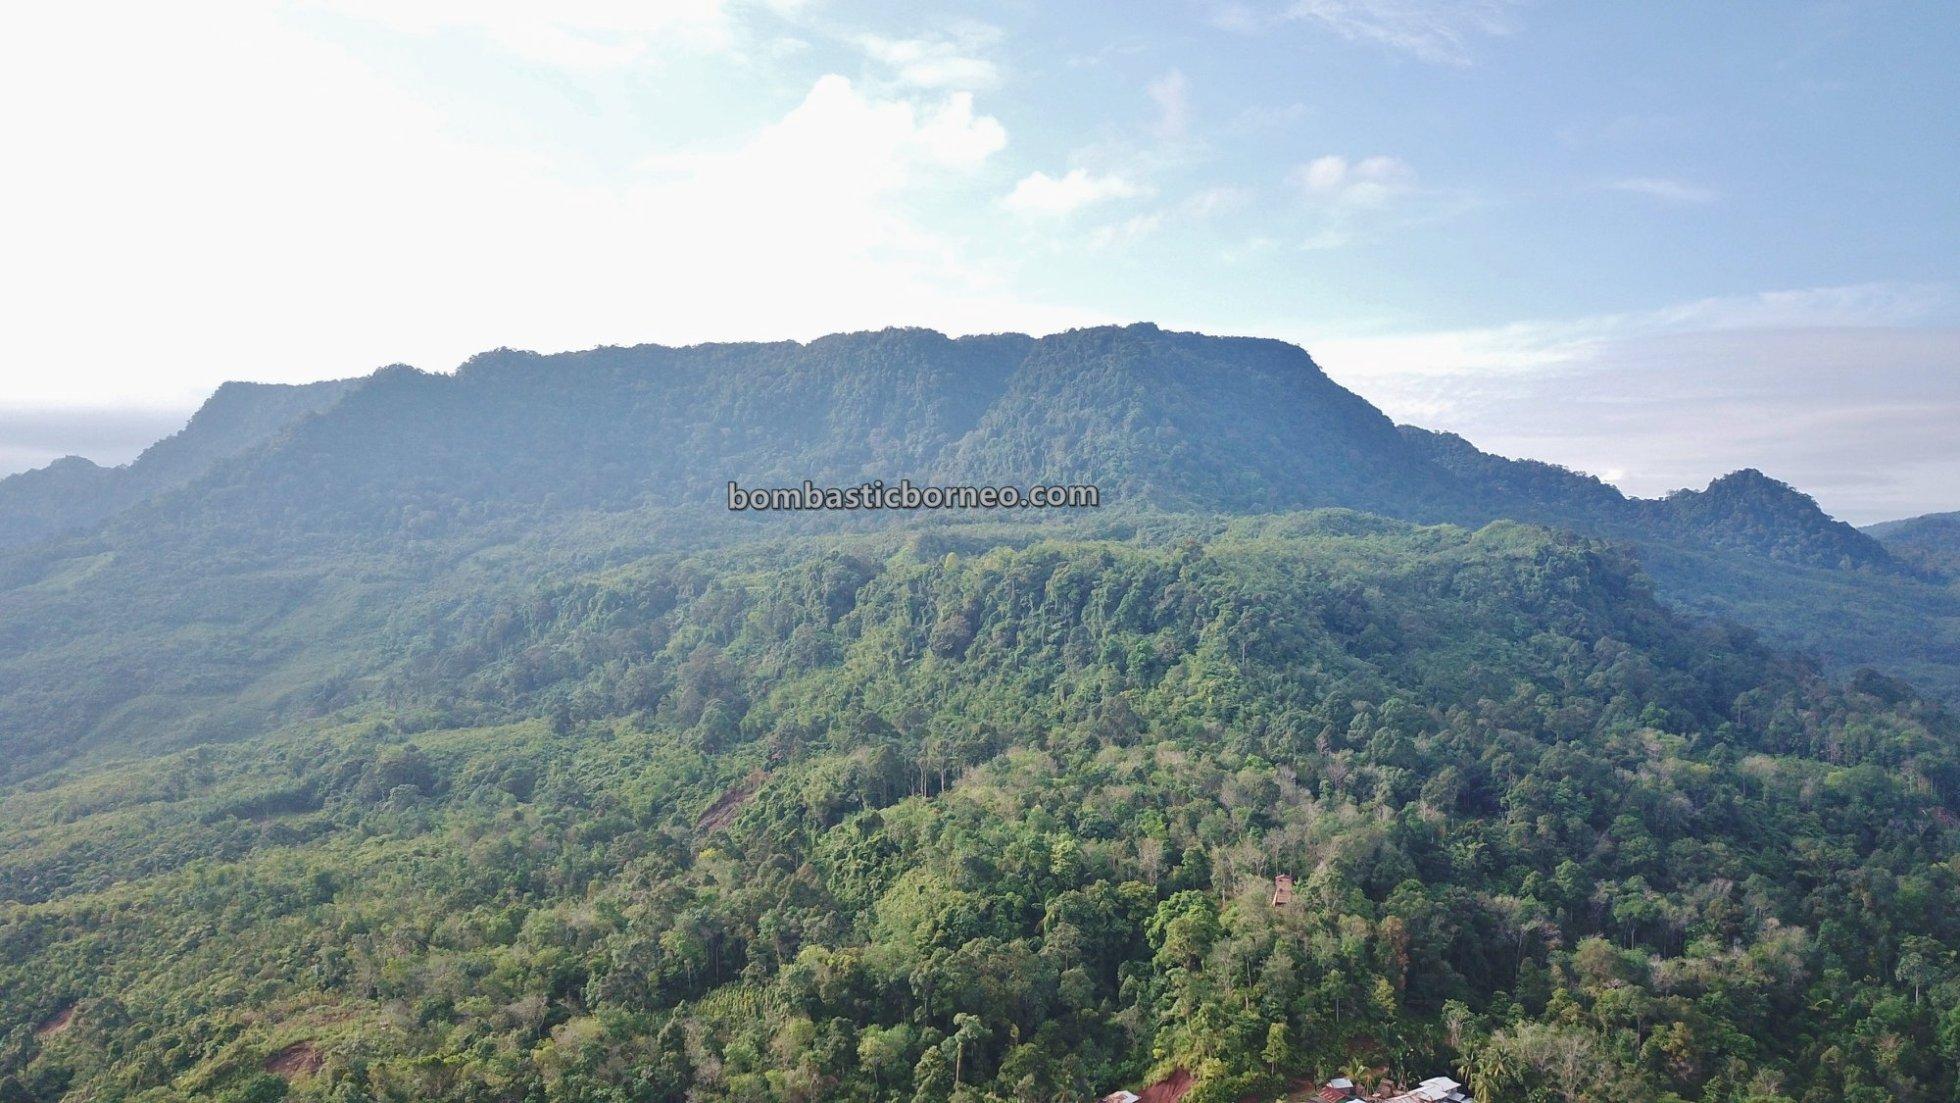 Desa Tamong, adventure, nature, traditional, destination, exploration, Bengkayang, Siding, native, Dayak Bidayuh, Tourist attraction, tourism, cross border, 探索婆罗洲高原, 印尼西加里曼丹,